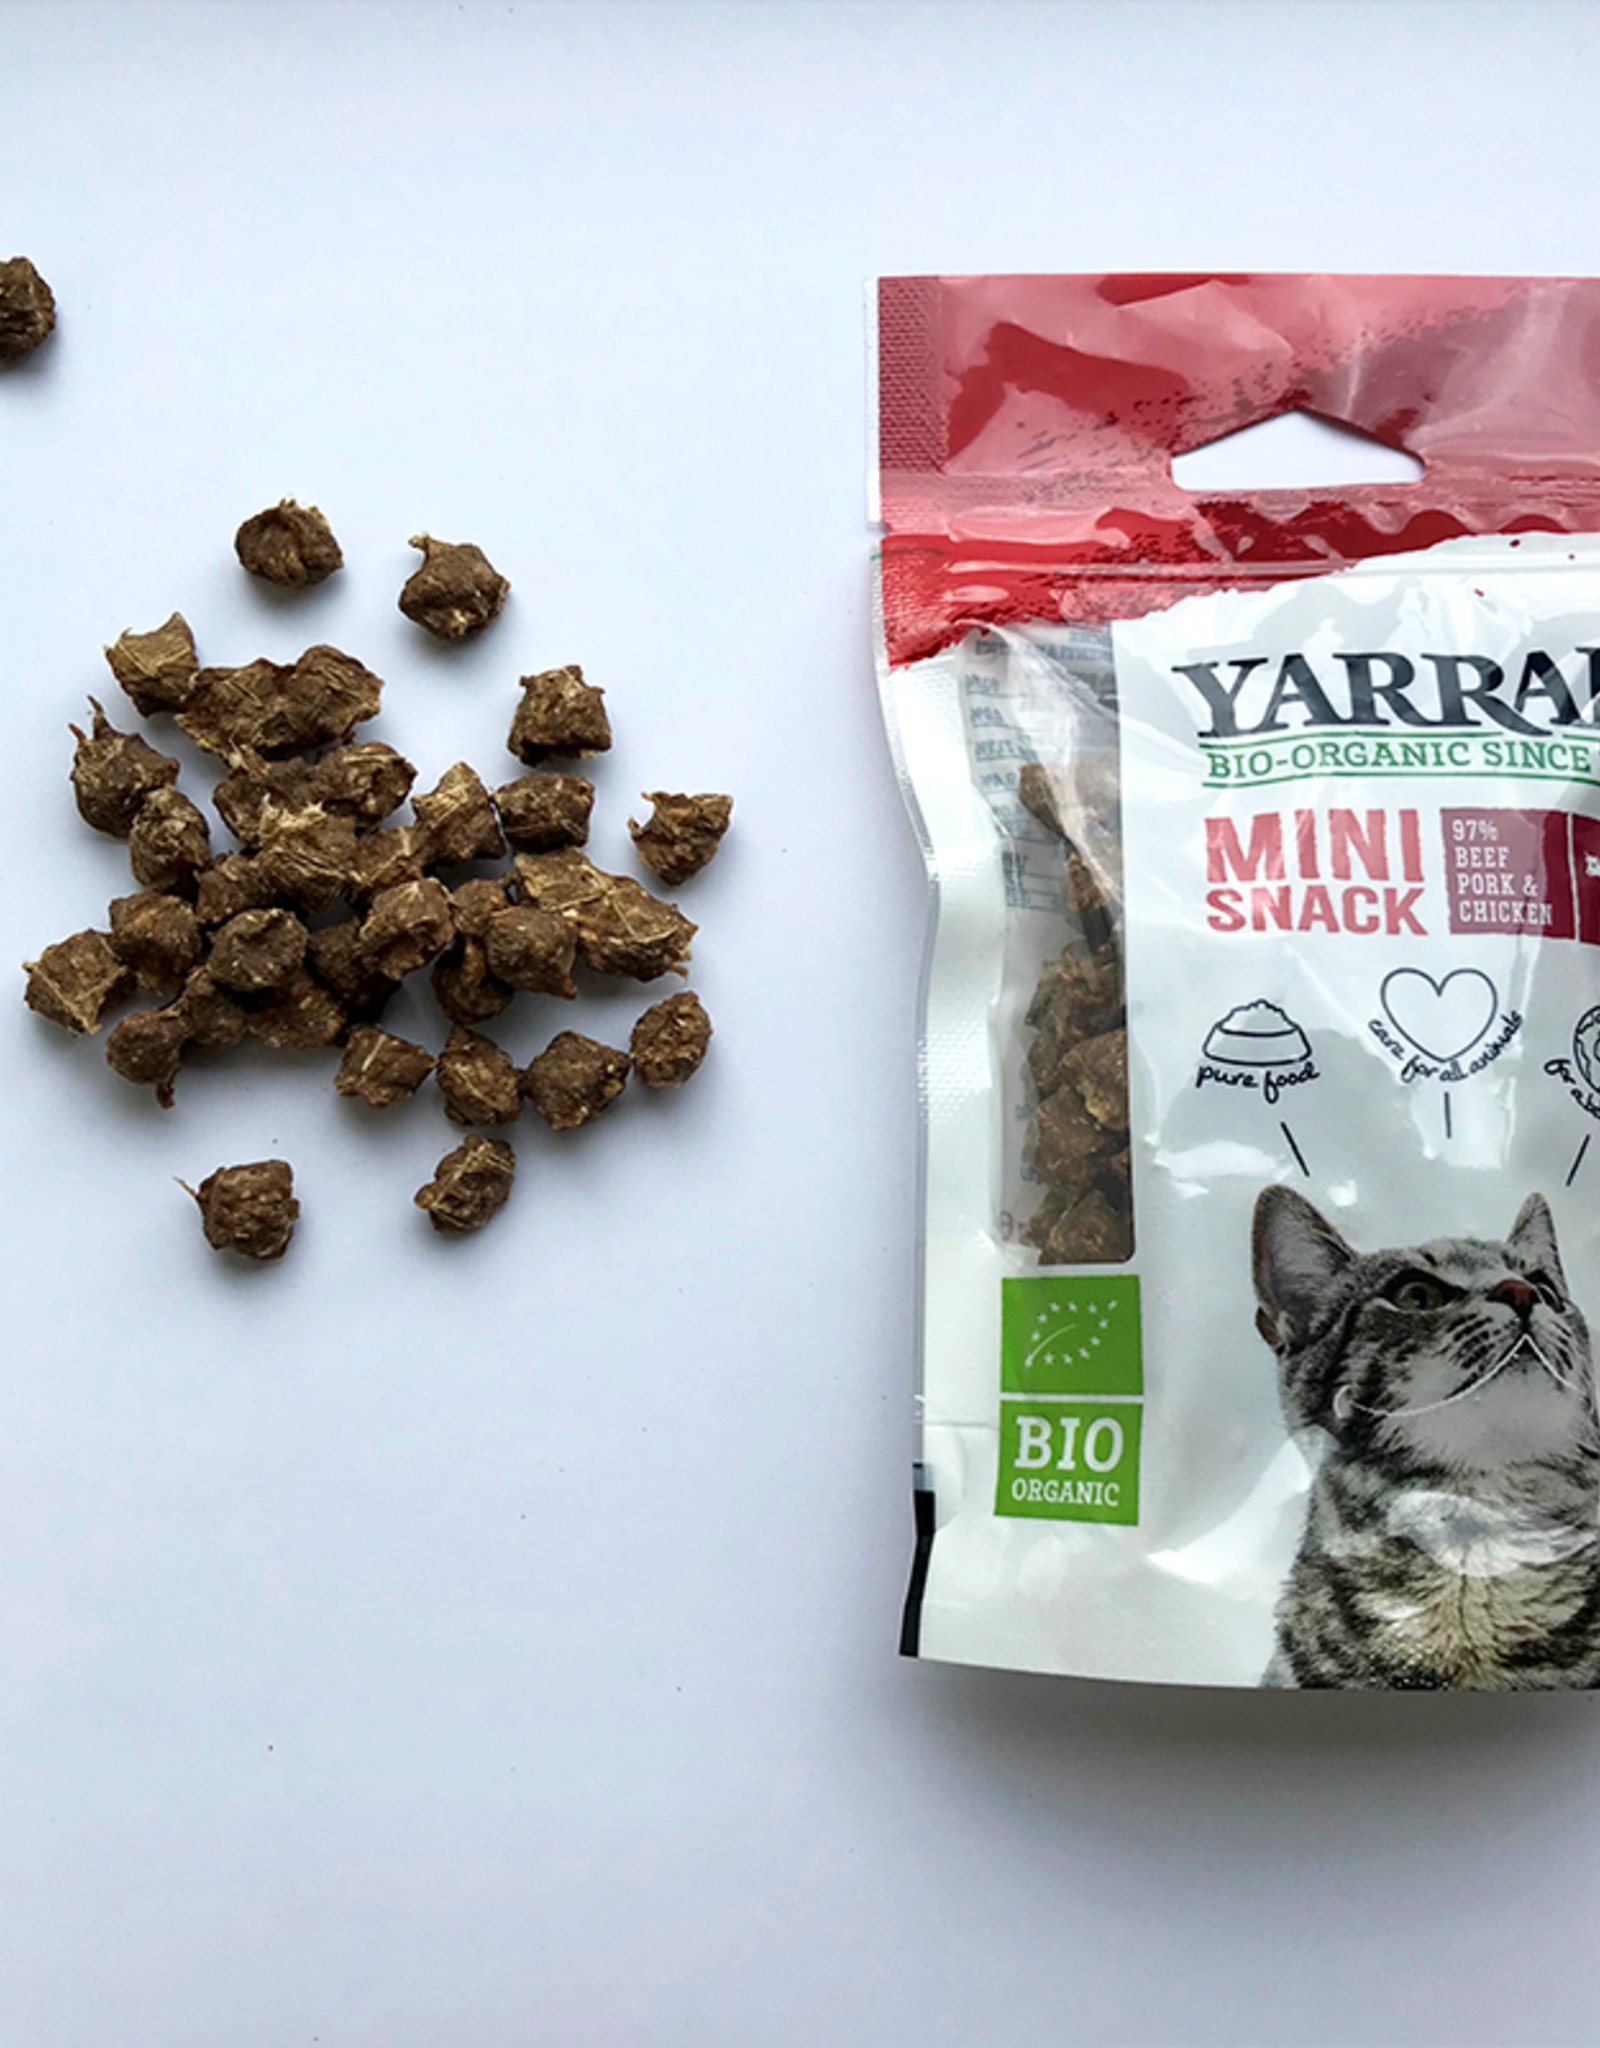 Yarrah Yarrah - biologische mini snack